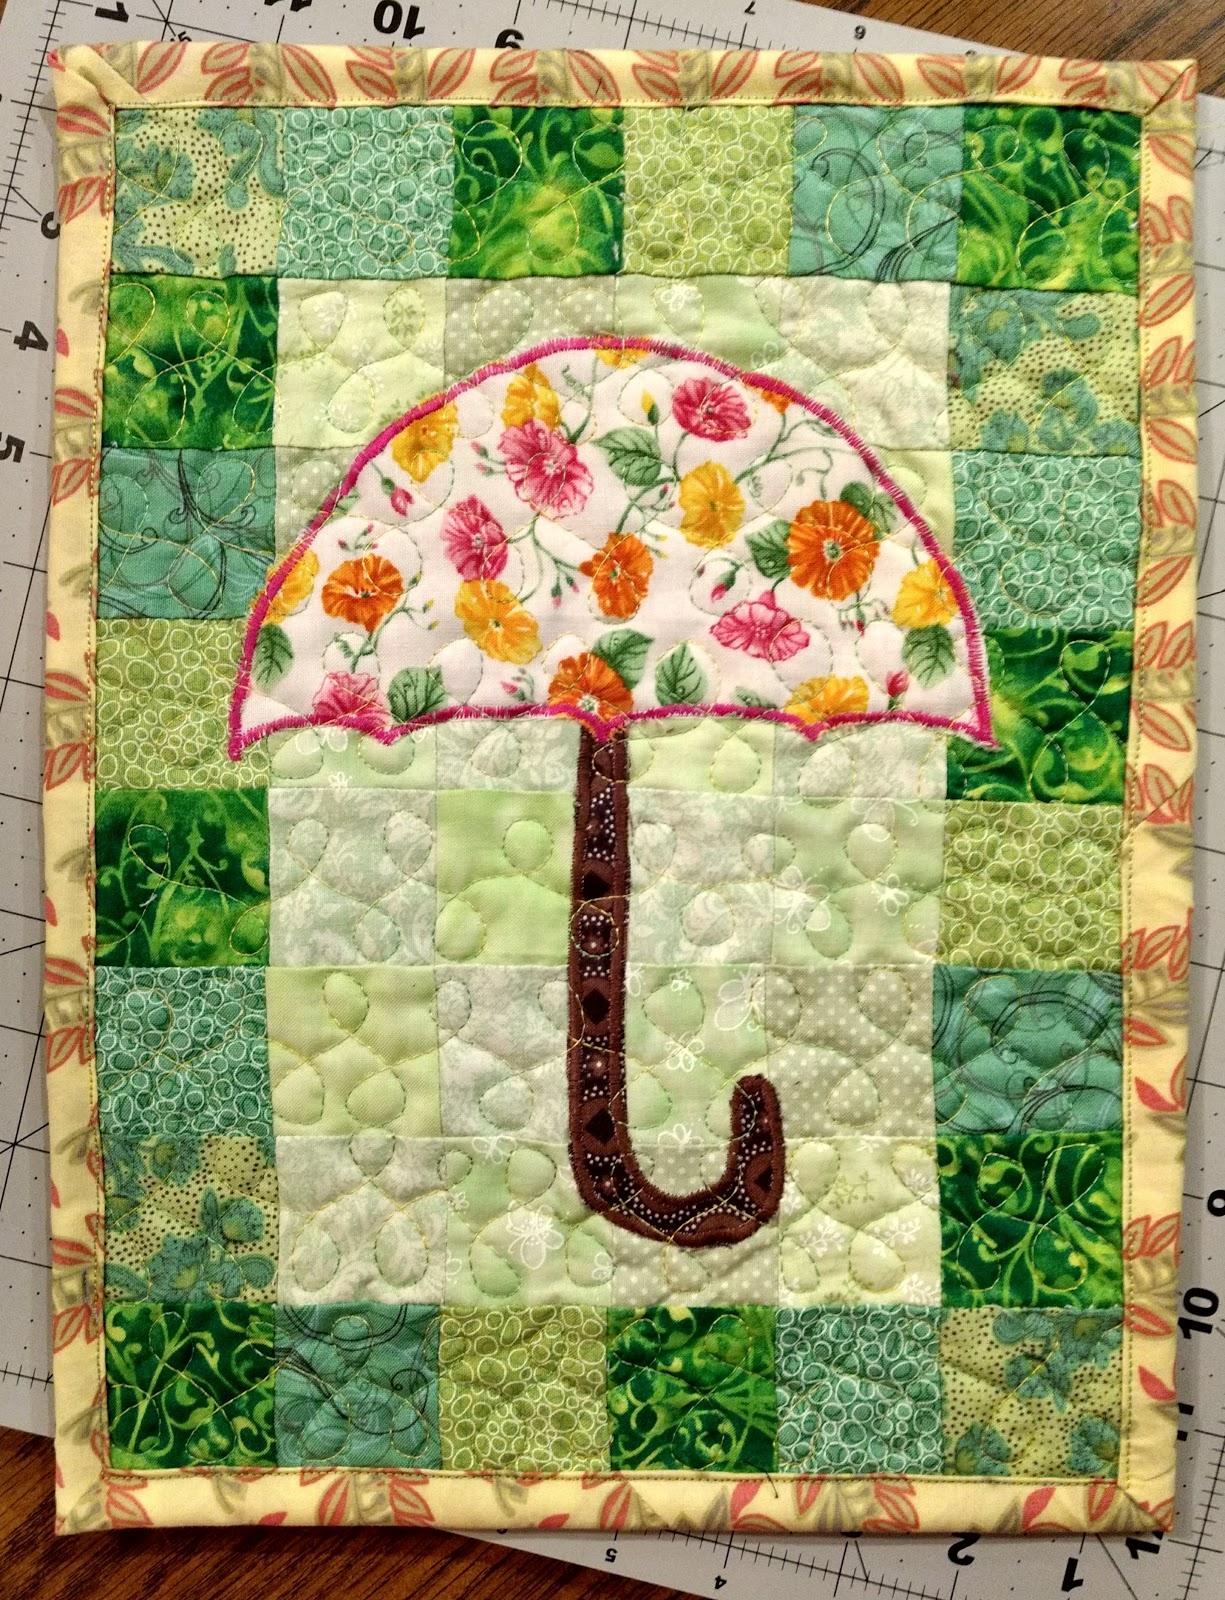 Little Bunny Quilts: April Cubicle Quilt {Finished Mini}